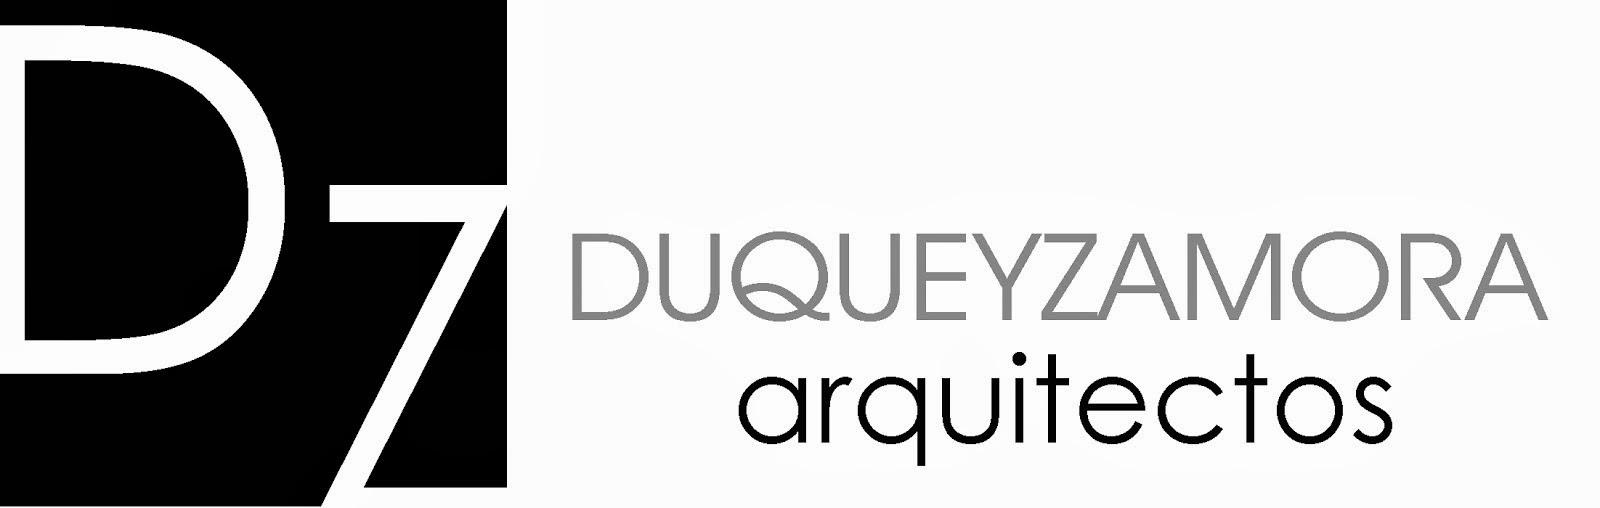 DUQUEYZAMORA arquitectos